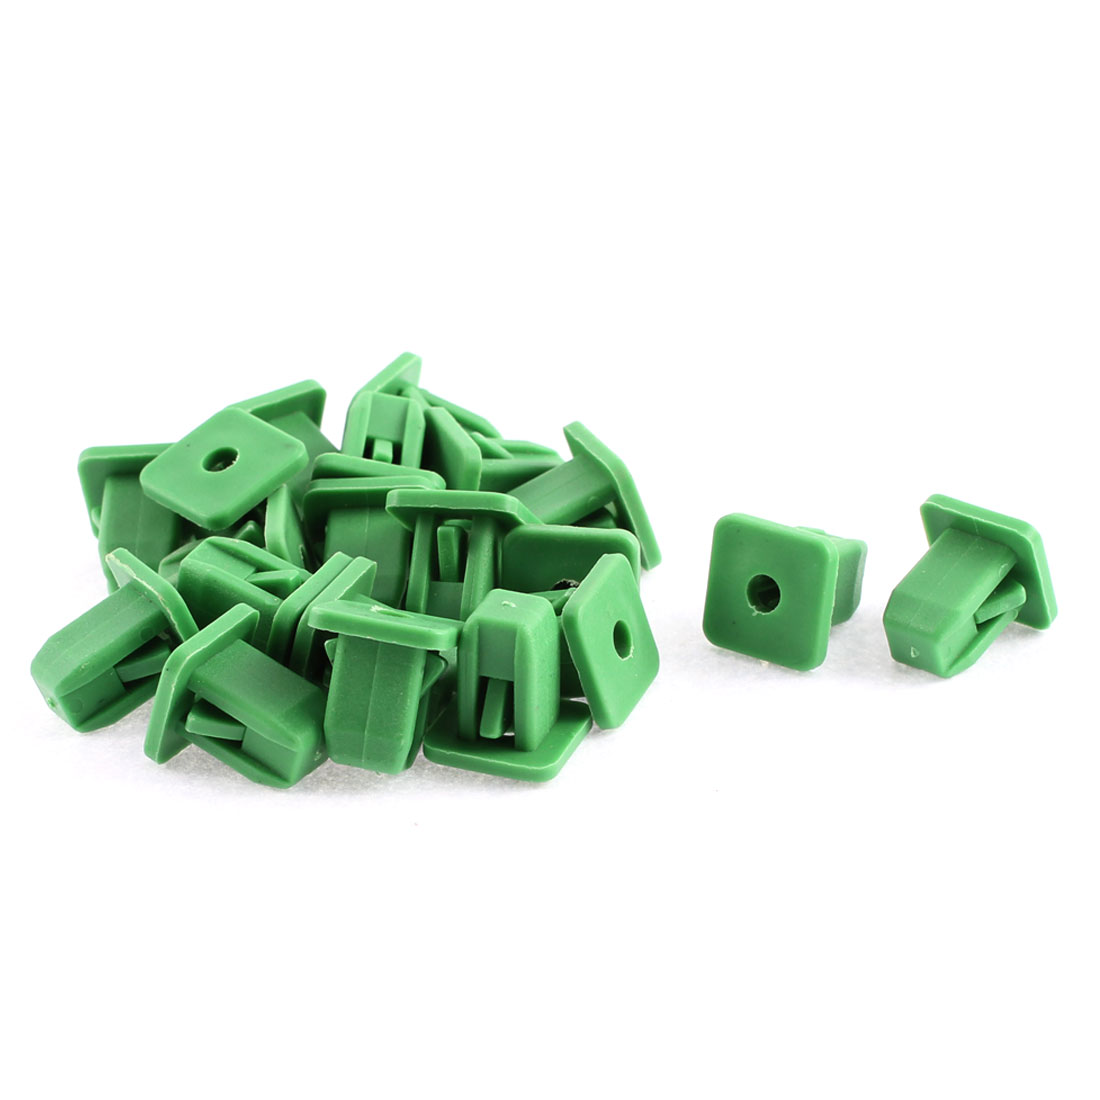 20 Pcs Green Plastic Interior Moulding Trim Rivets Fastener Clips